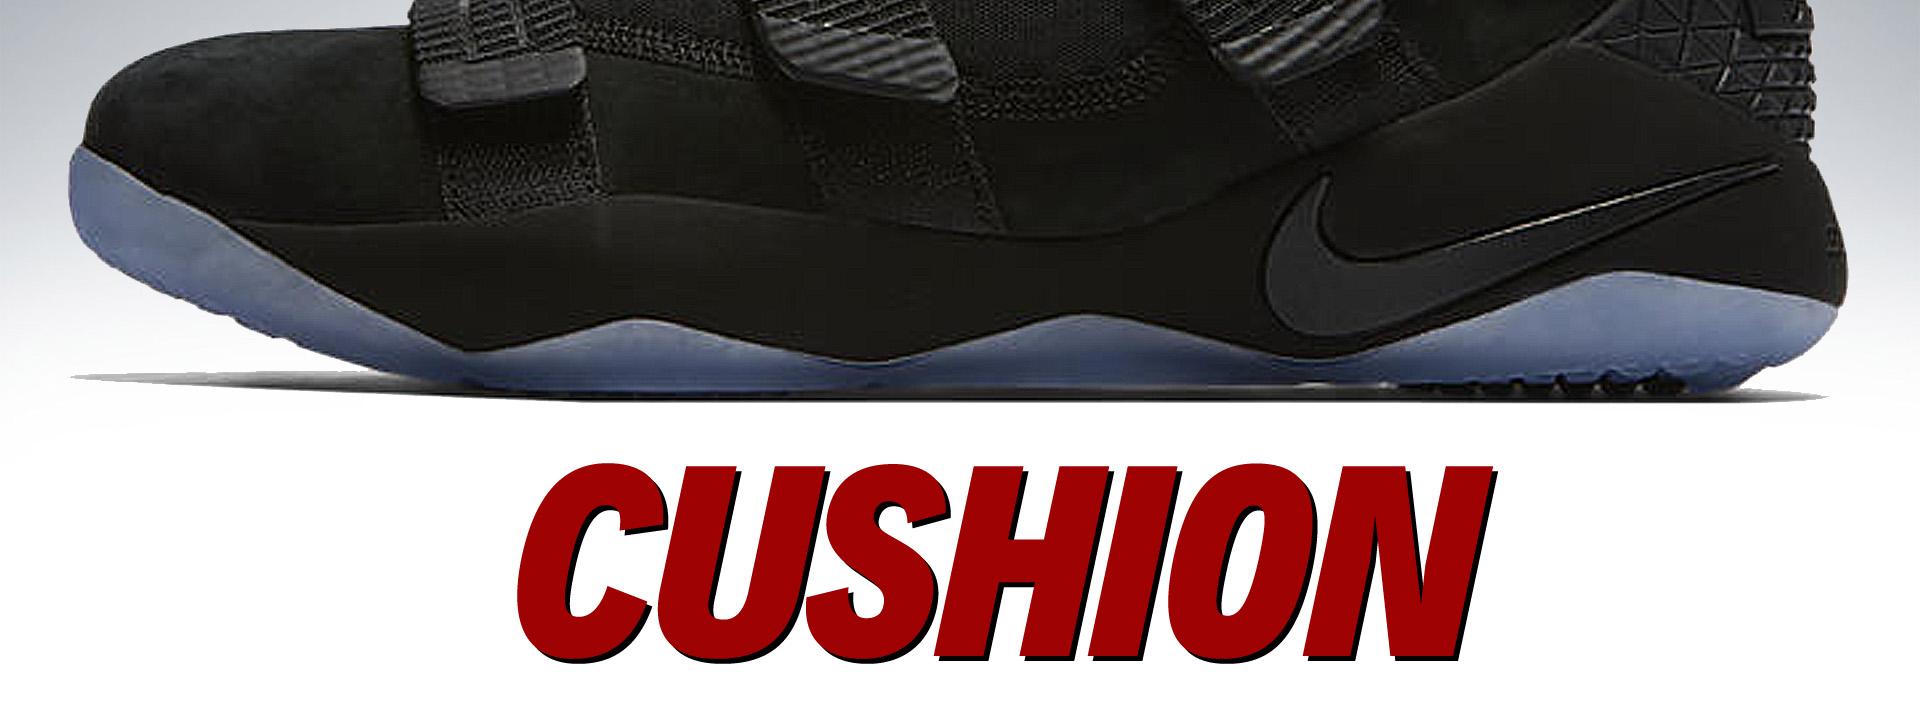 promo code 01c77 e5121 Nike LeBron Soldier 11 Premium Performance Review ...